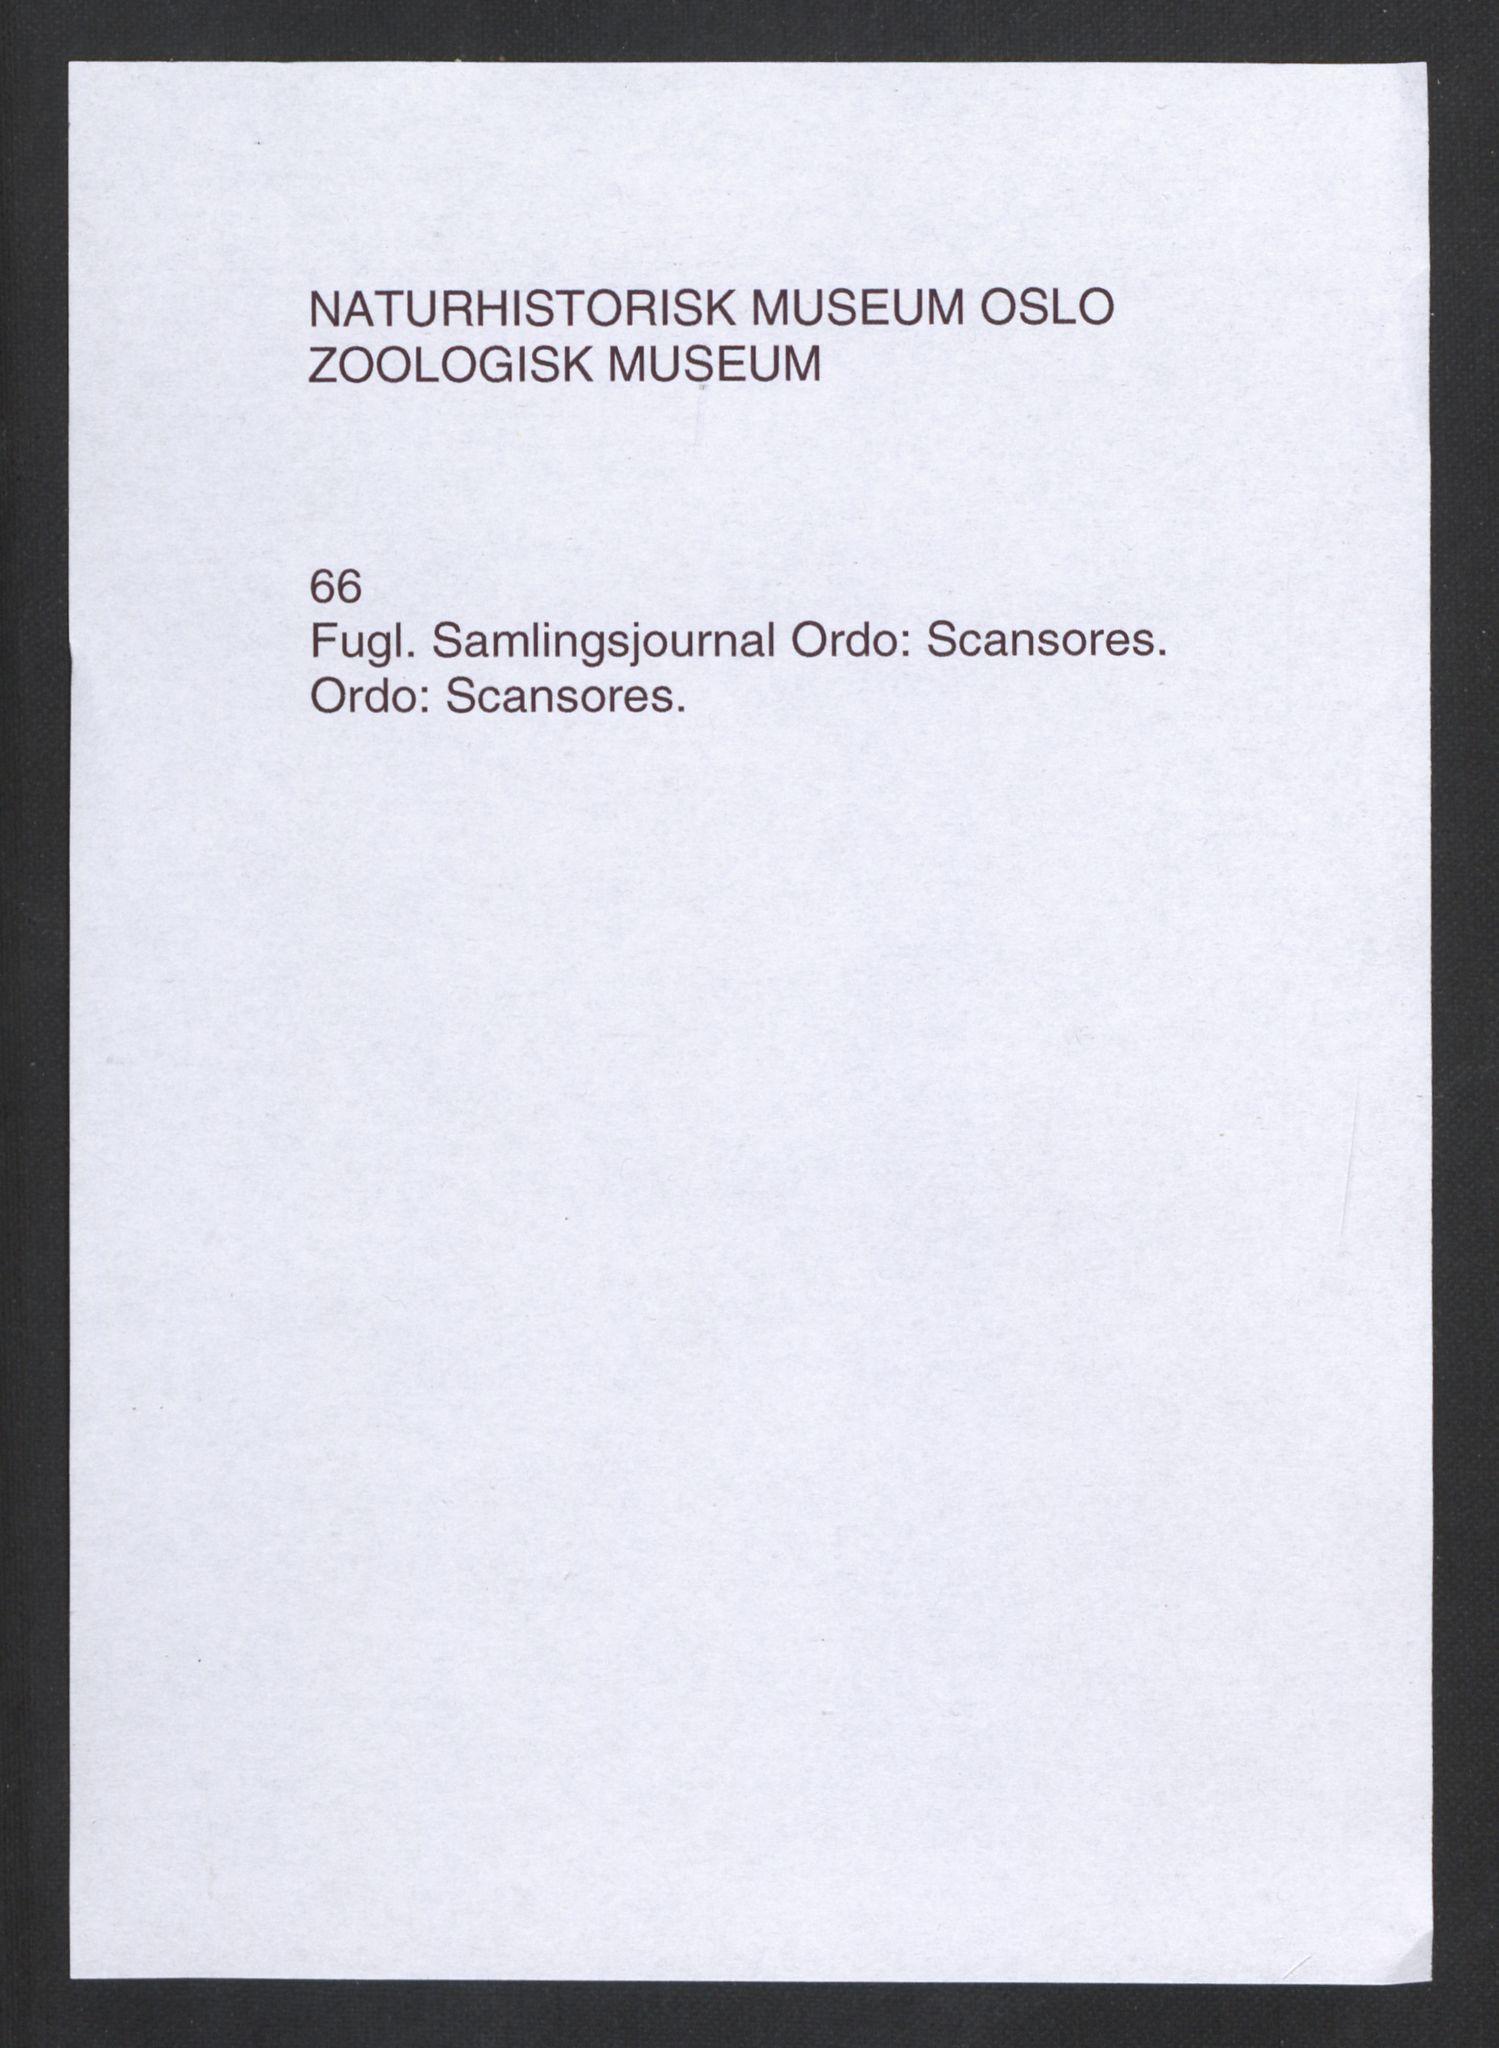 NHMO, Naturhistorisk museum (Oslo), 2: Fugl. Taksonomisk journal. Ordo: Scansores